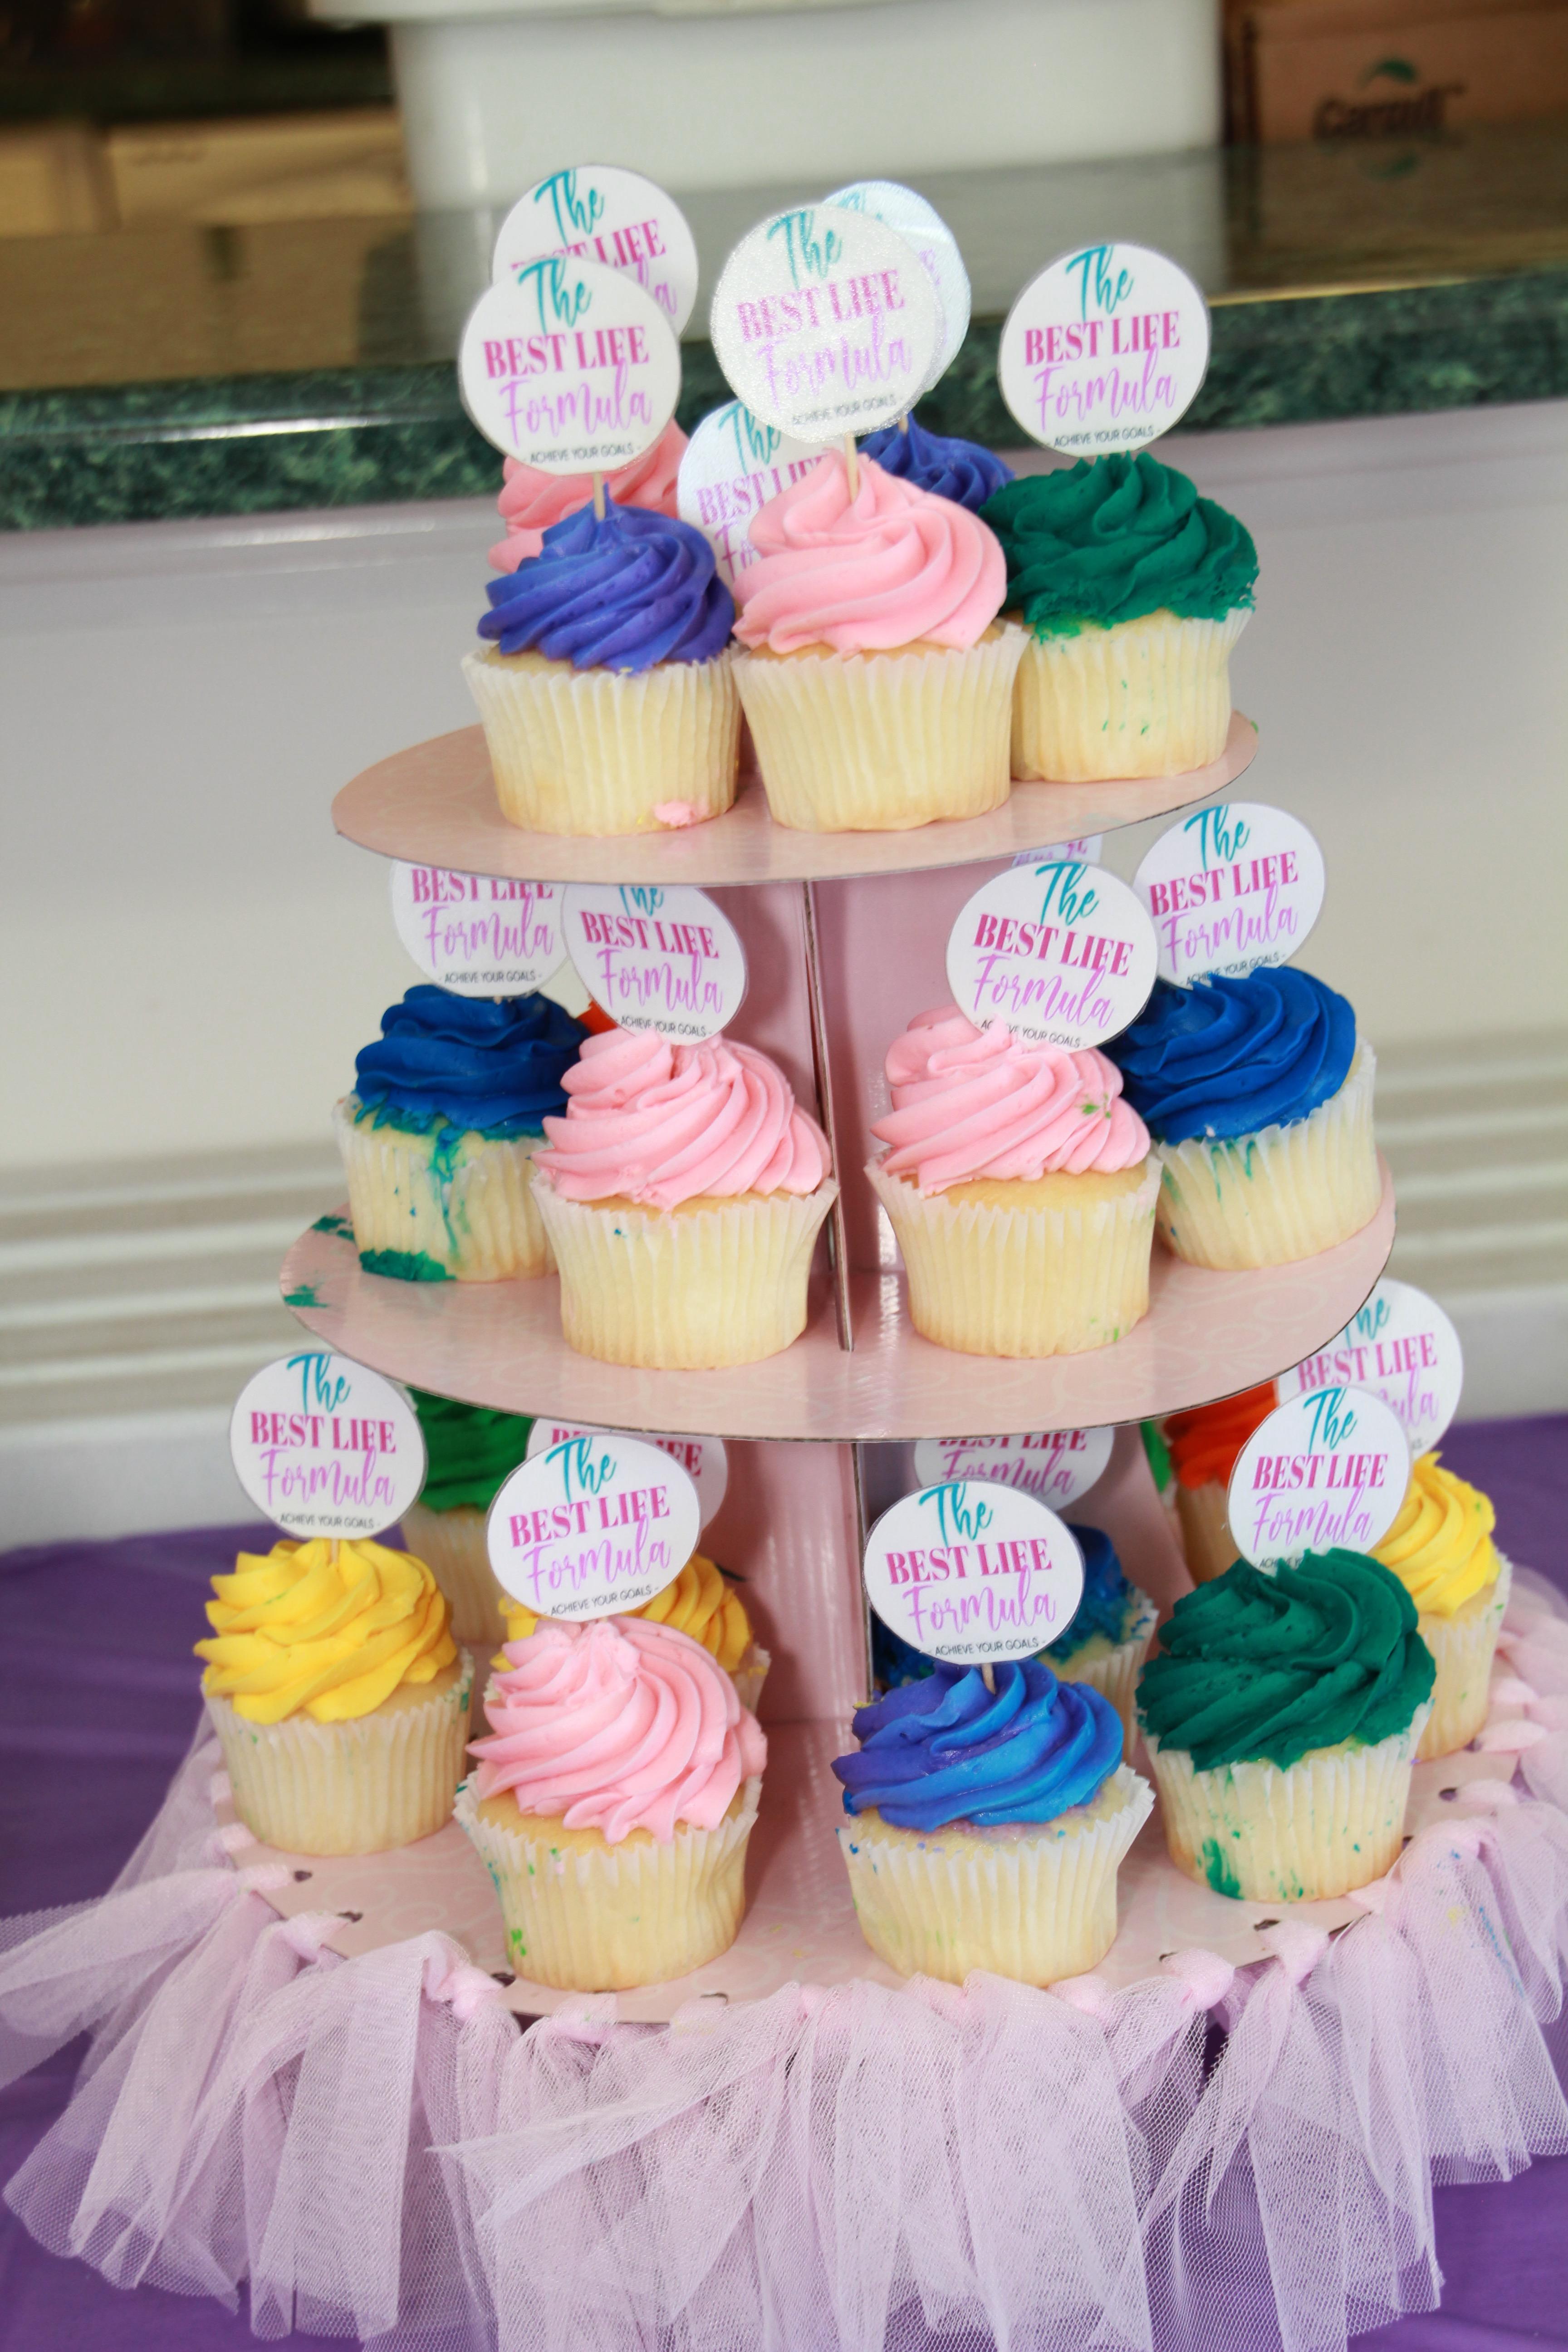 Best Life Formula cupcakes